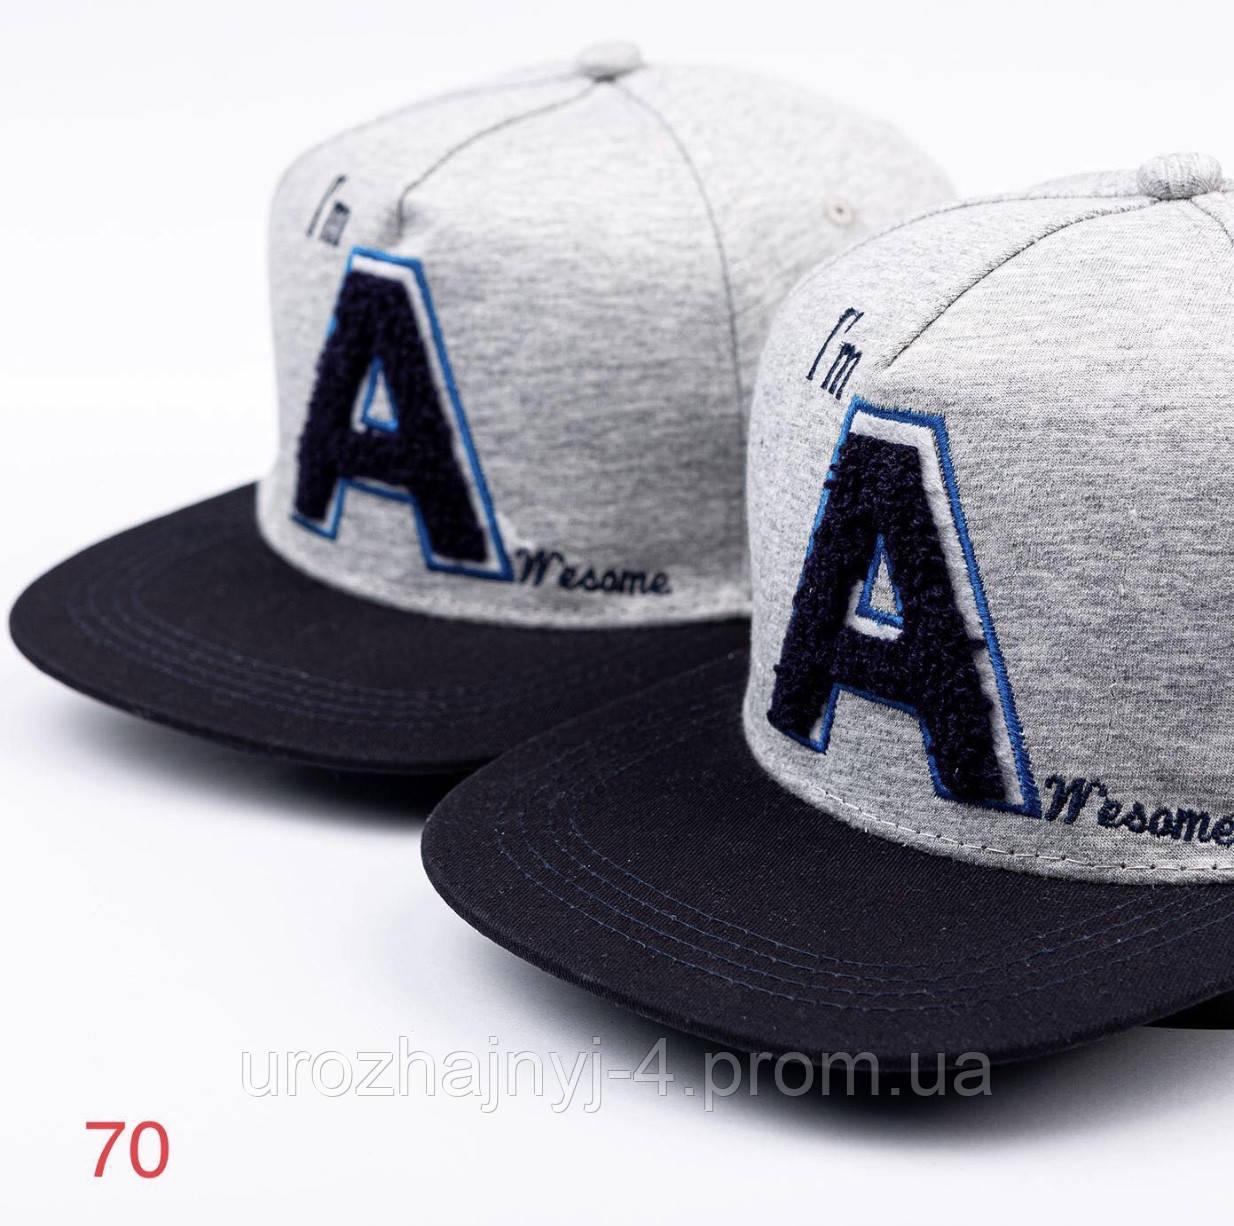 Трикотажная кепка/бейсболка/реперка размер 52-54 поштучно